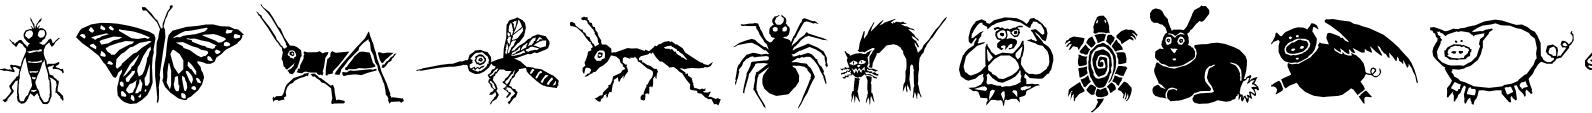 Design Font Wildlife